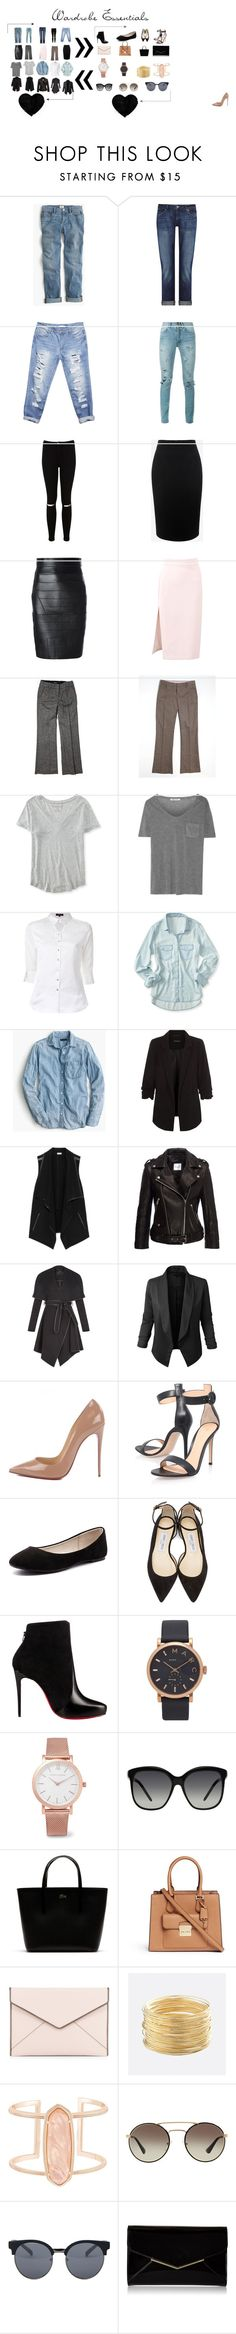 """Wardrobe Essentials"" by ebee2009 on Polyvore featuring J.Crew, DL1961 Premium Denim, Wet Seal, Yves Saint Laurent, Miss Selfridge, Alexander McQueen, Dsquared2, MSGM, Bebe and Gap"